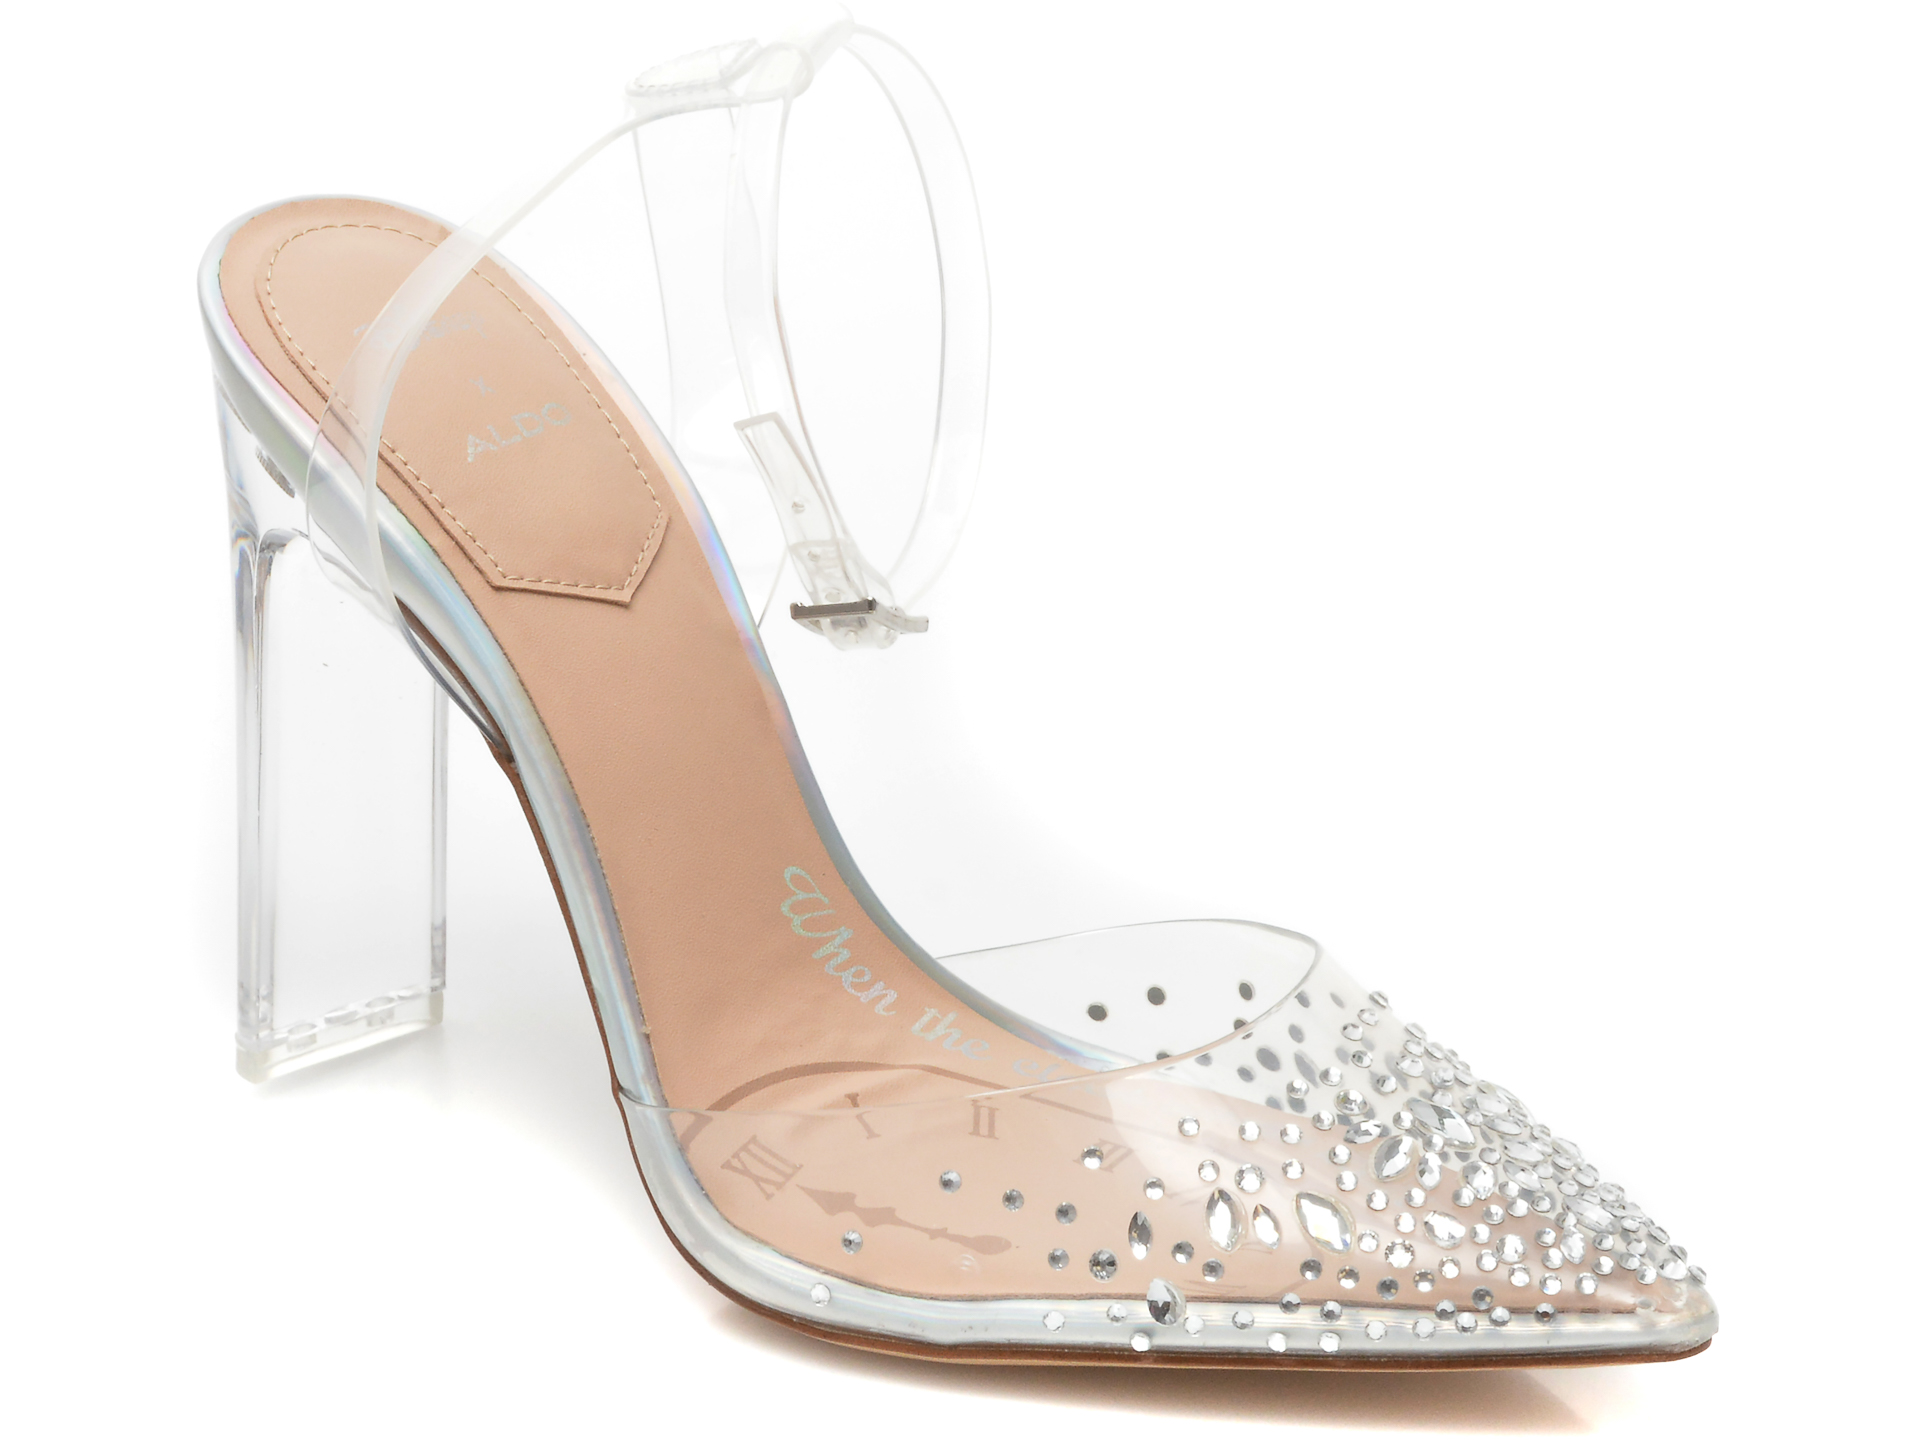 Pantofi Aldo Transparenti, 13350913, Din Pvc